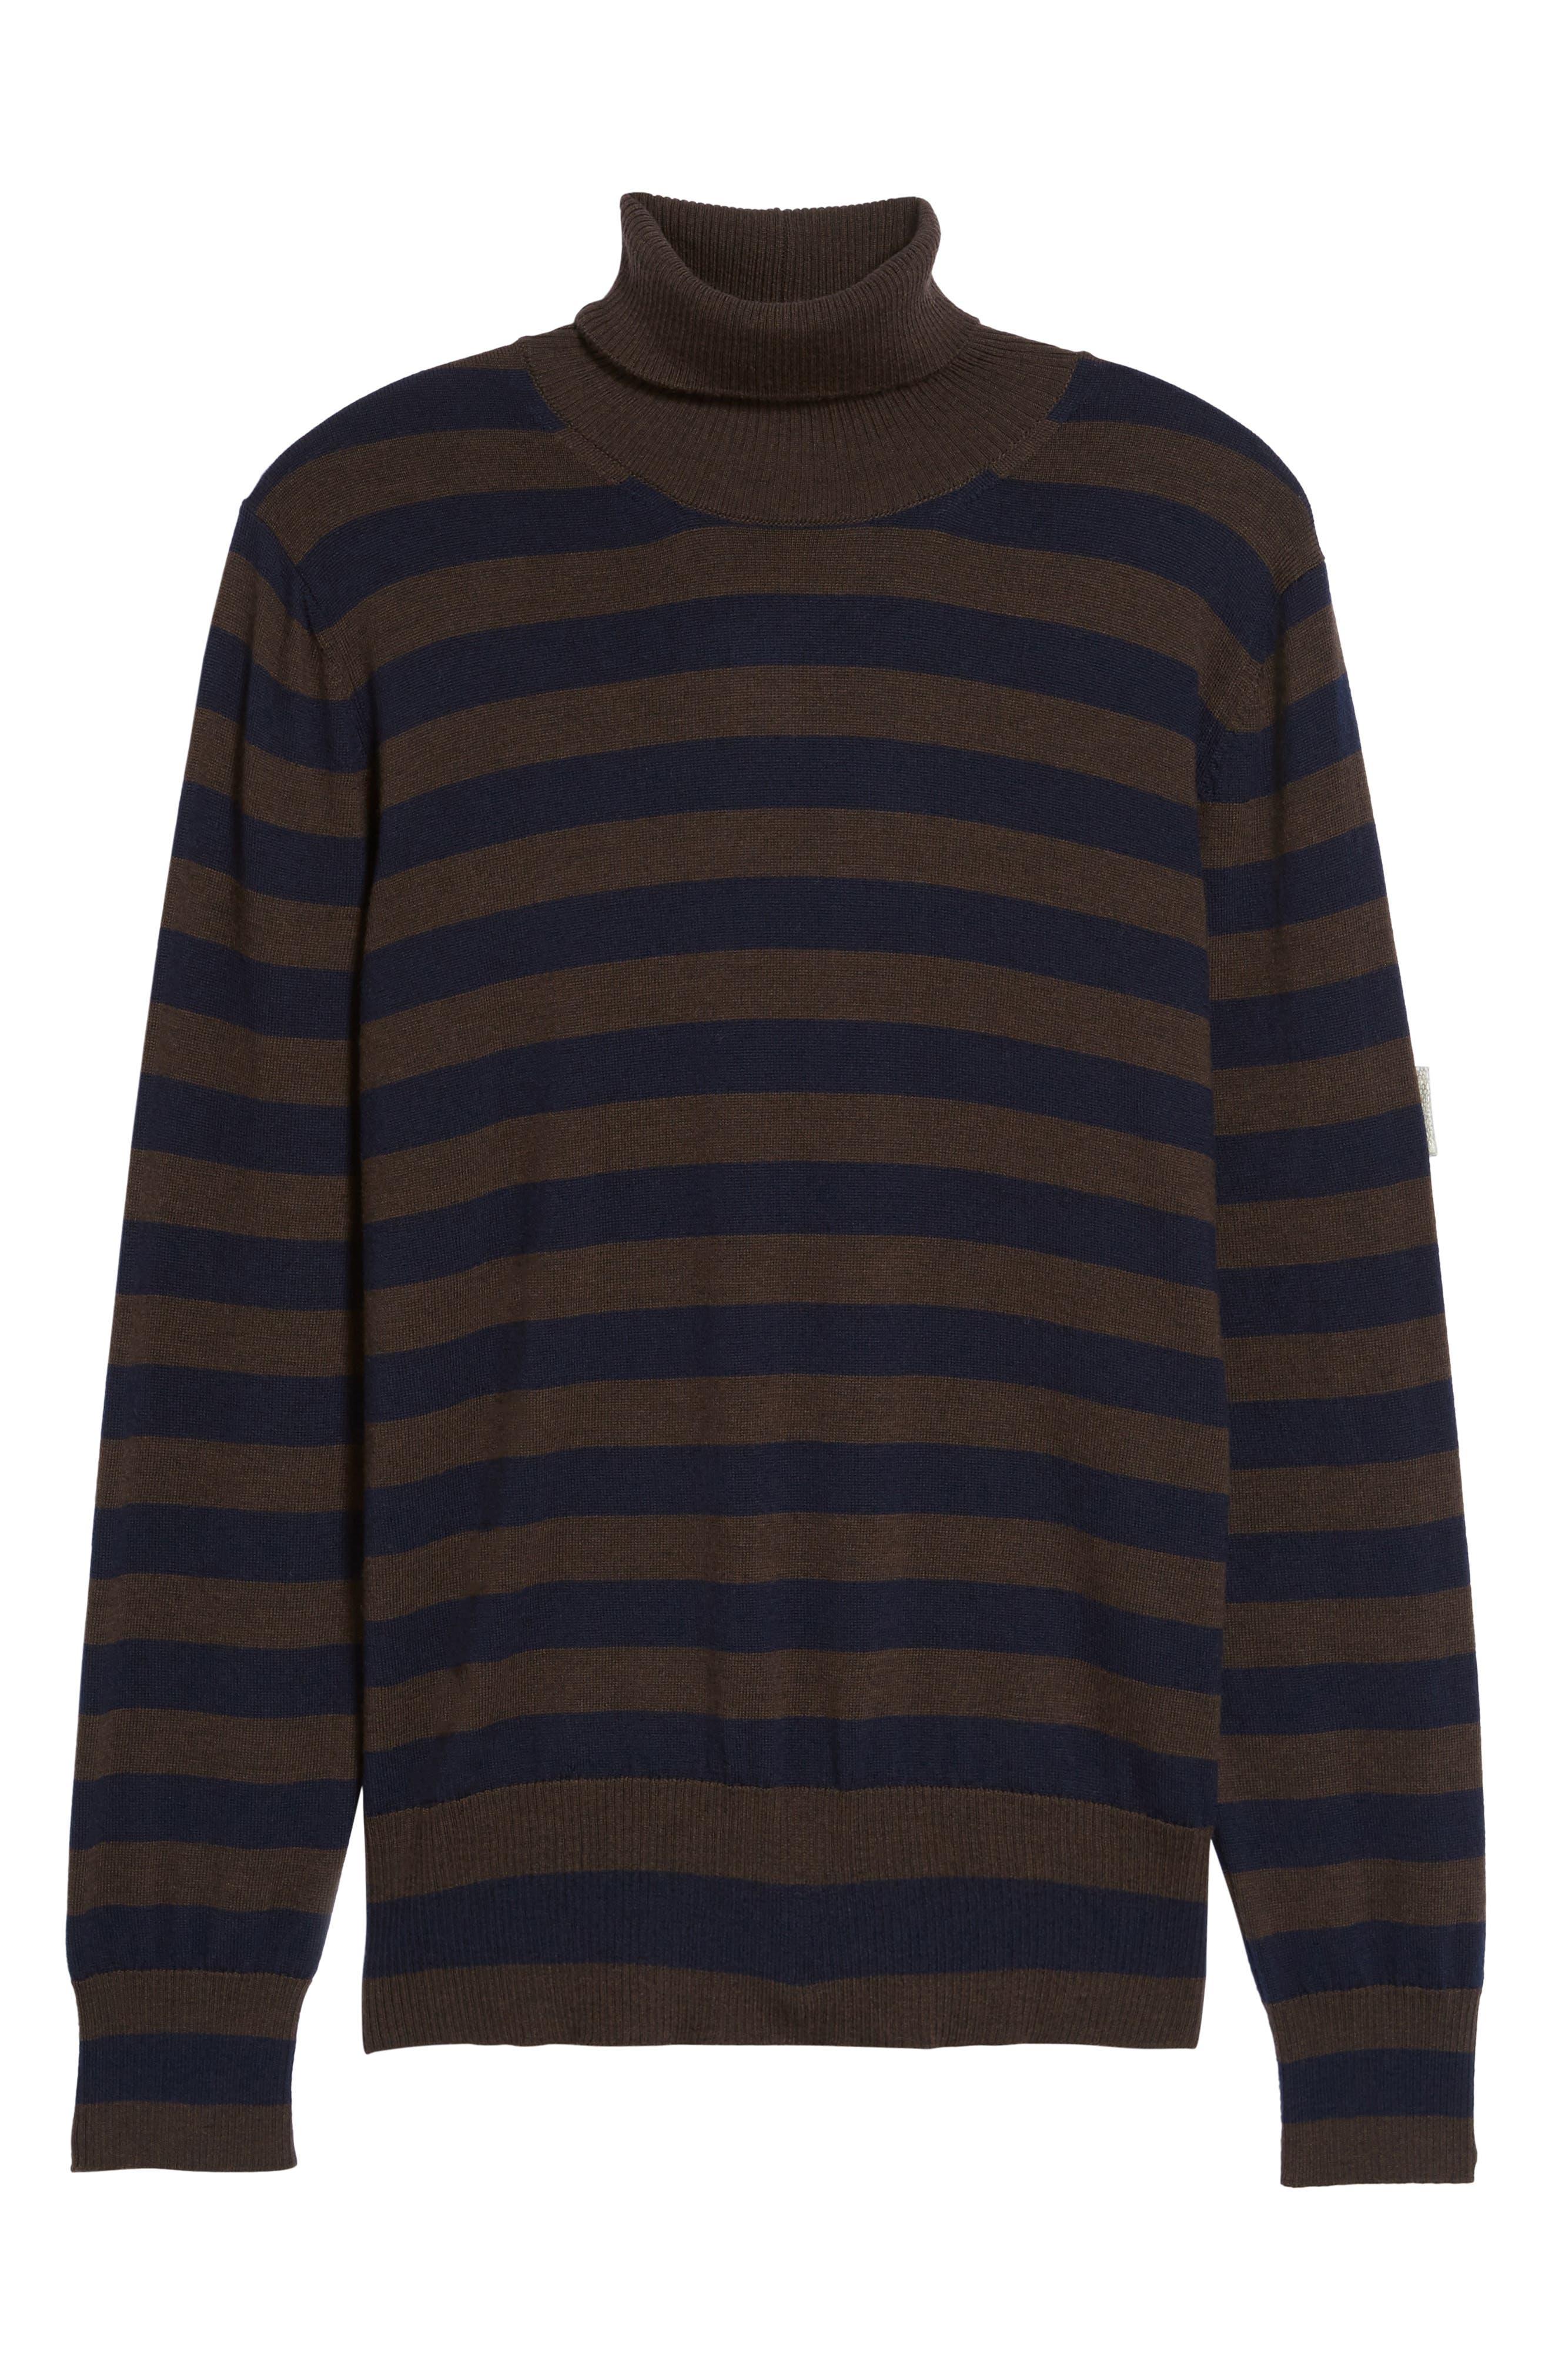 Striped Turtleneck Sweater,                             Alternate thumbnail 6, color,                             204